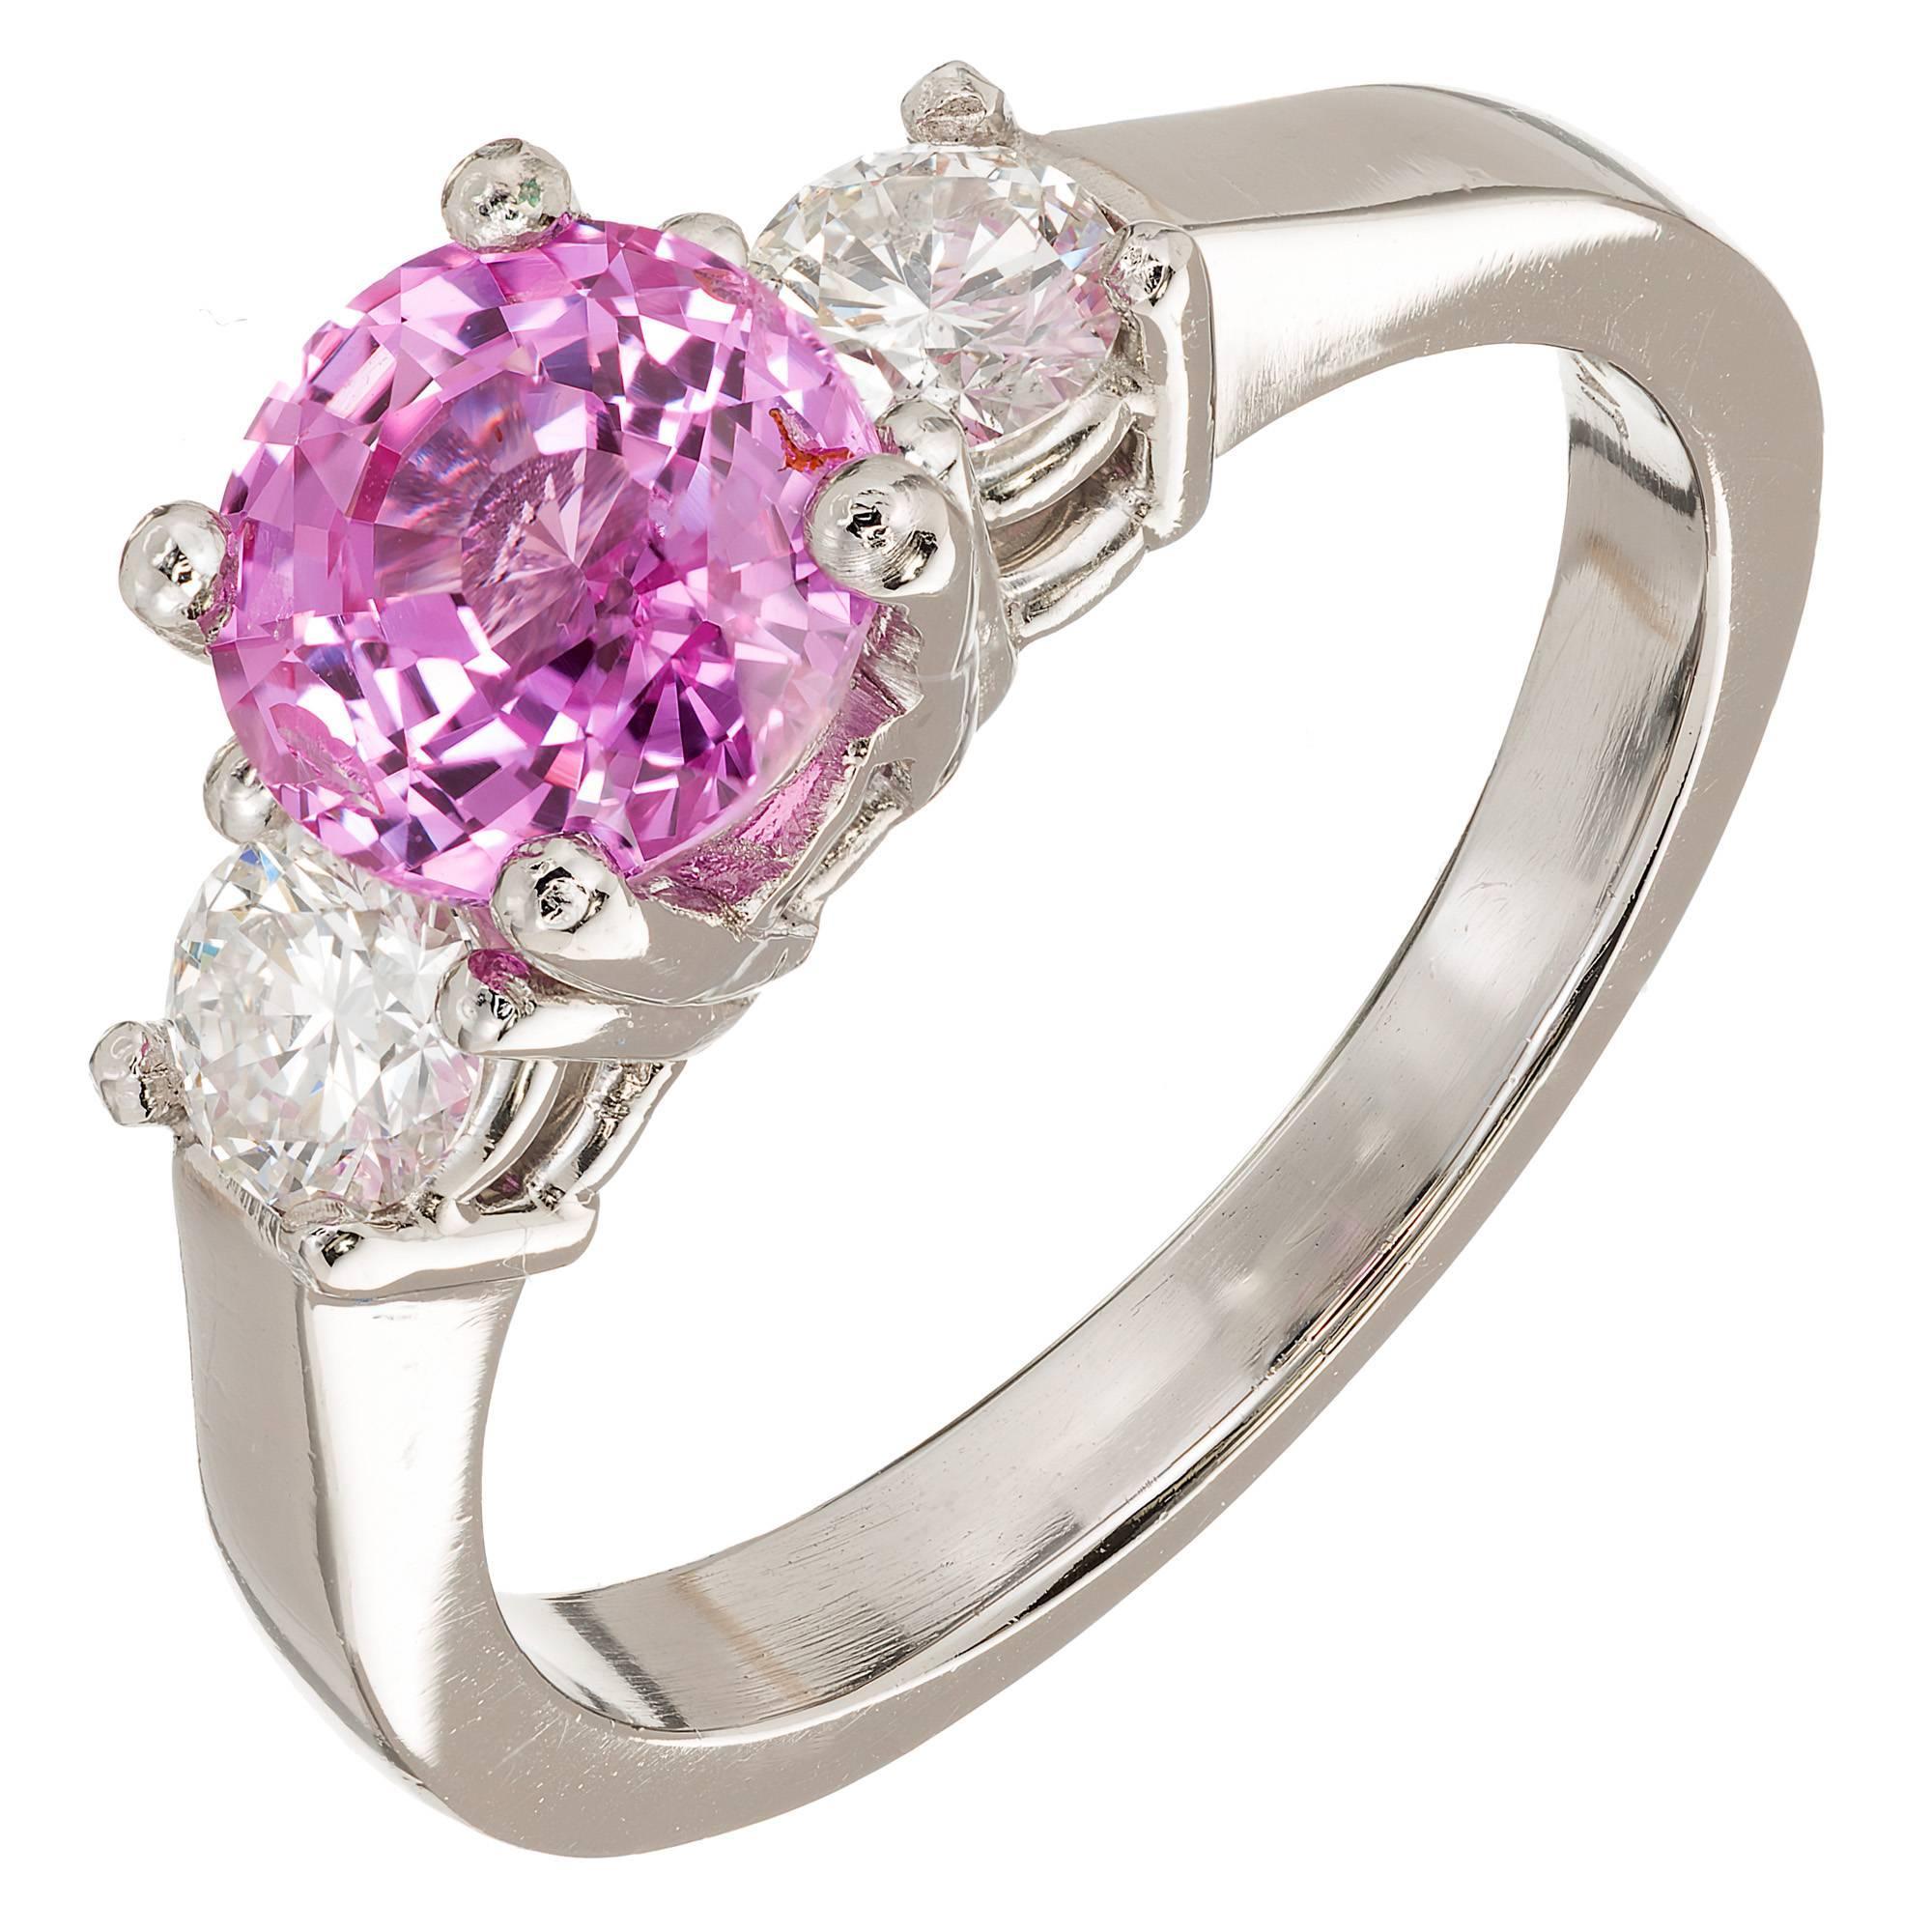 1.79 Carat Pink Sapphire Diamond Platinum Three-Stone Engagement Ring